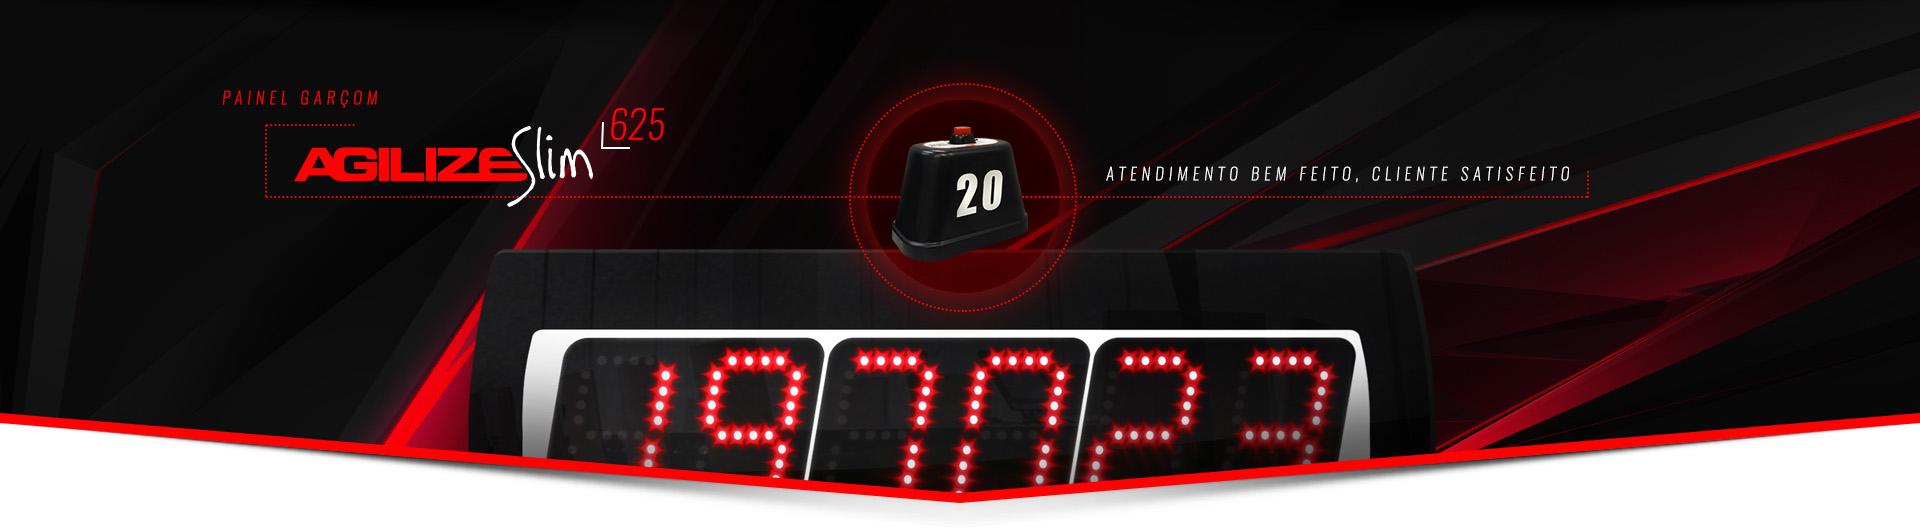 Agilize Slim 625 GA